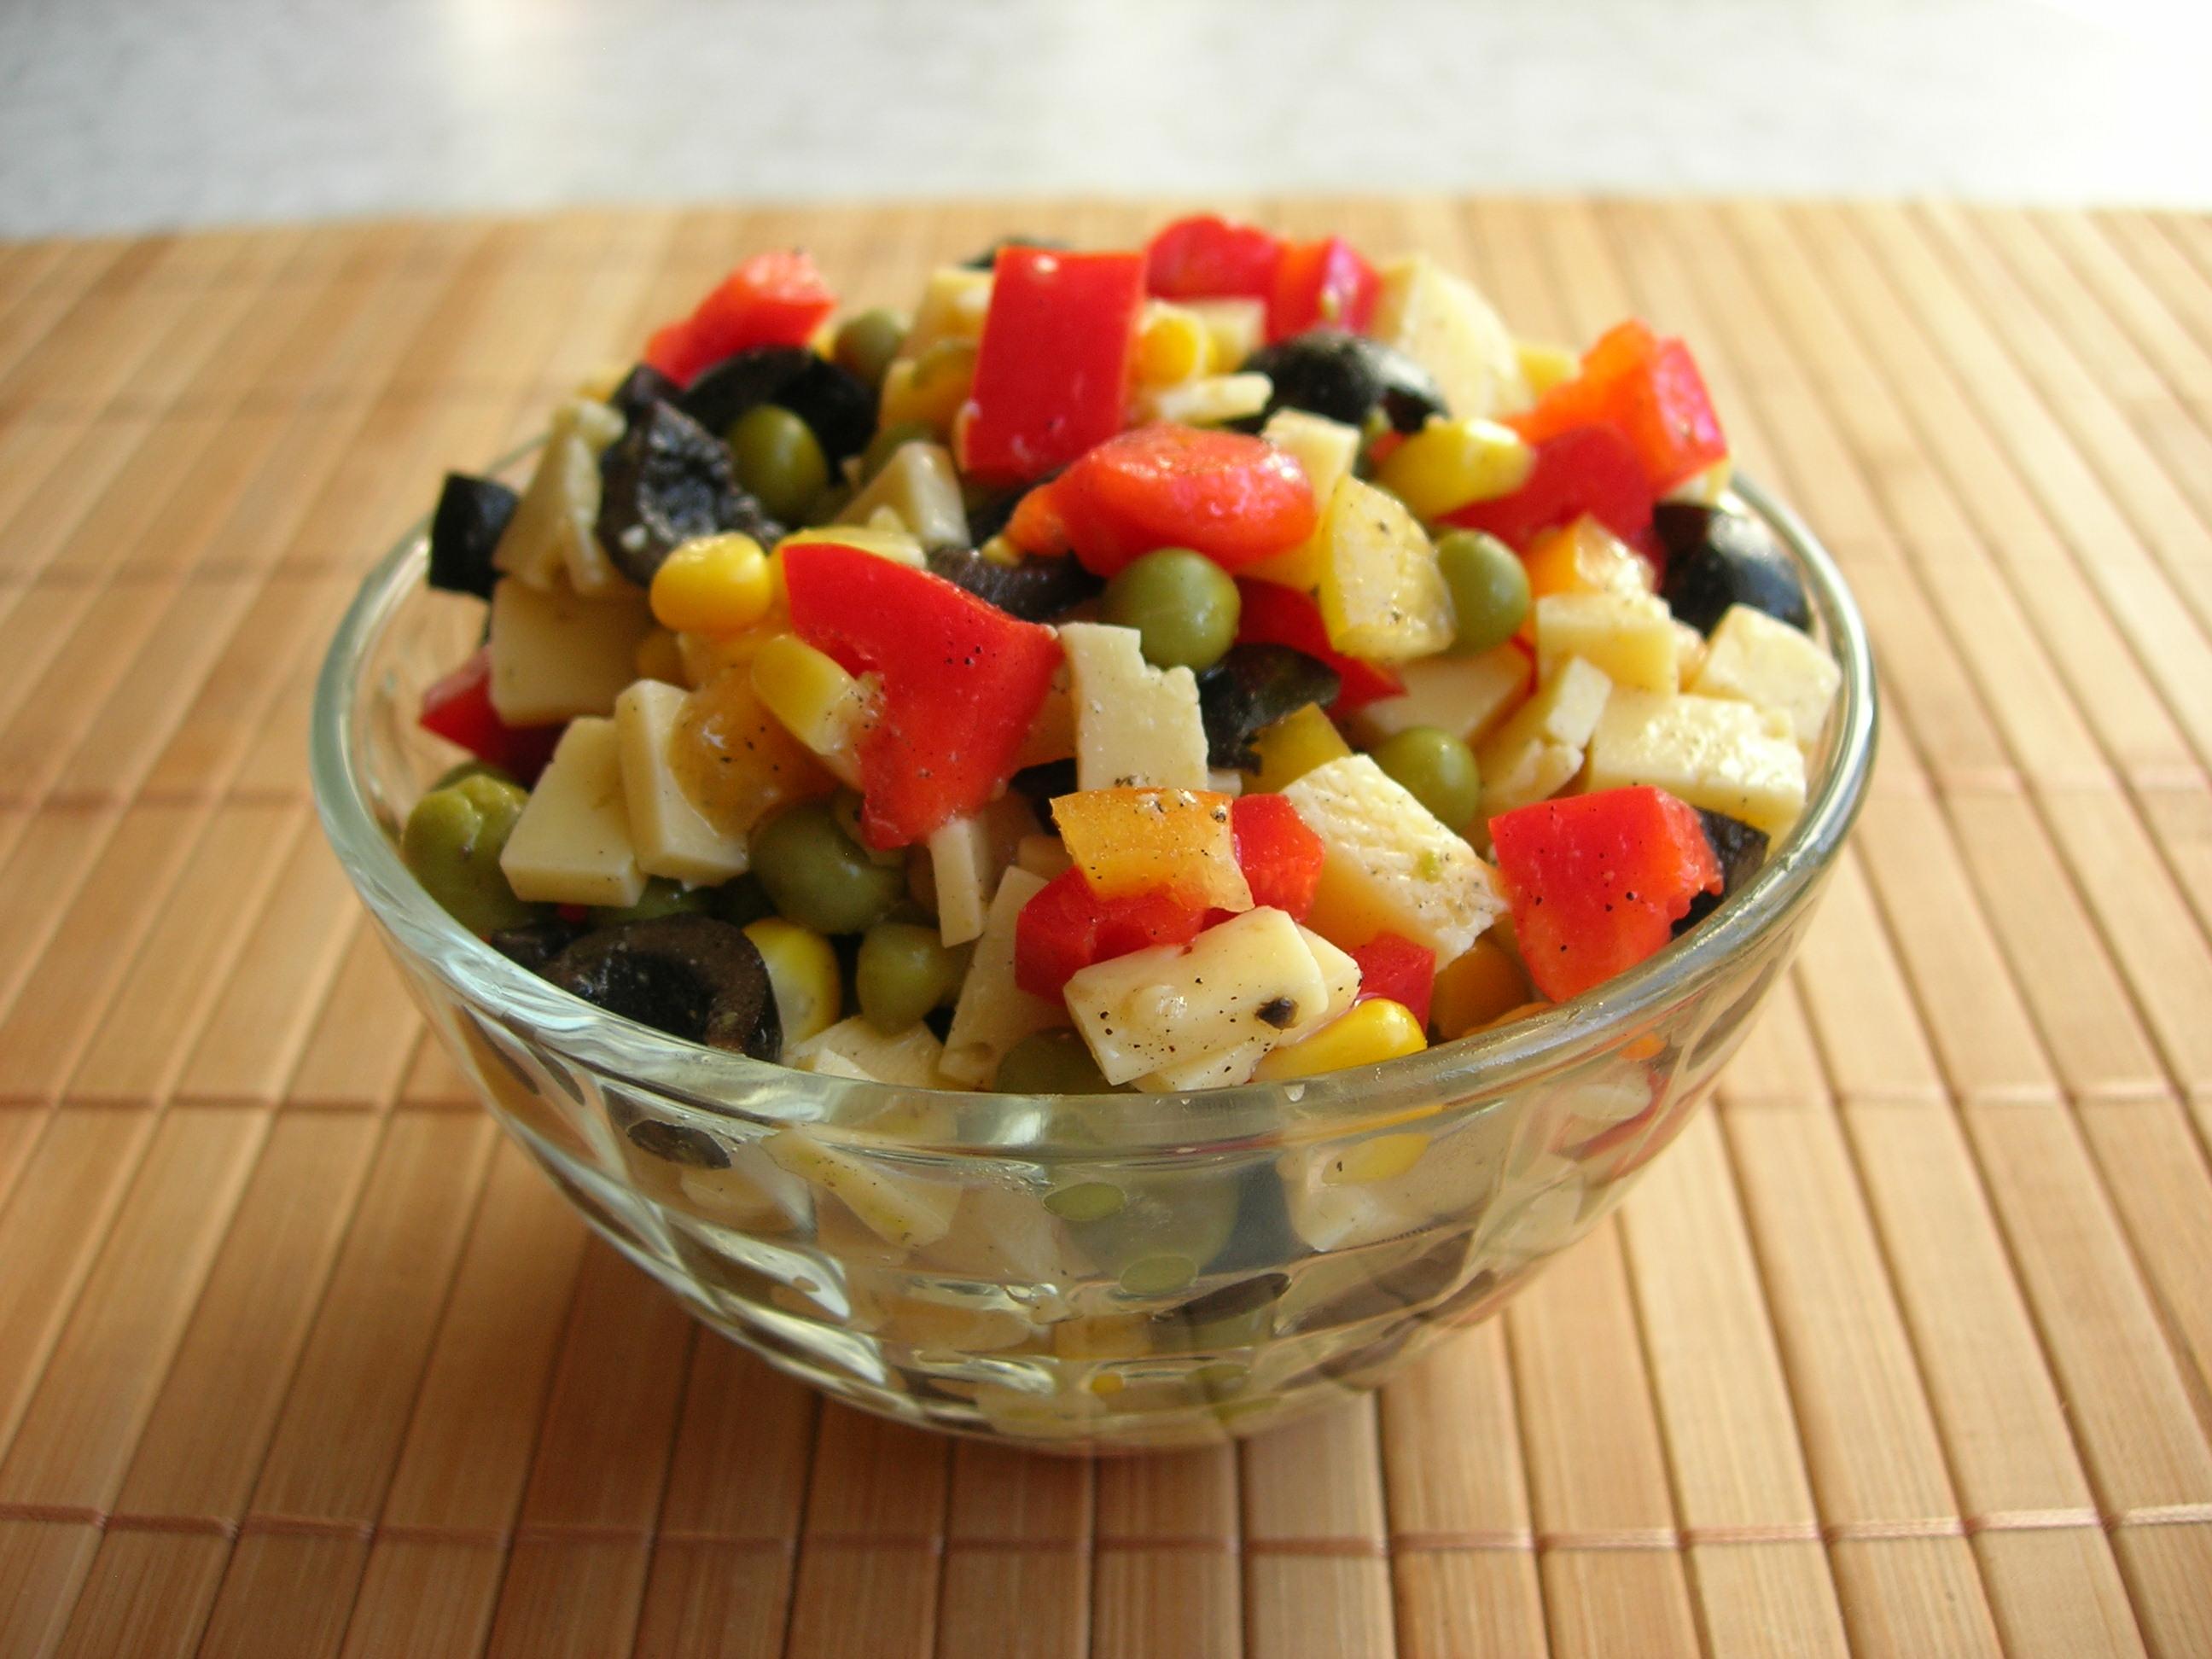 Праздничный салат без майонеза рецепт с фото